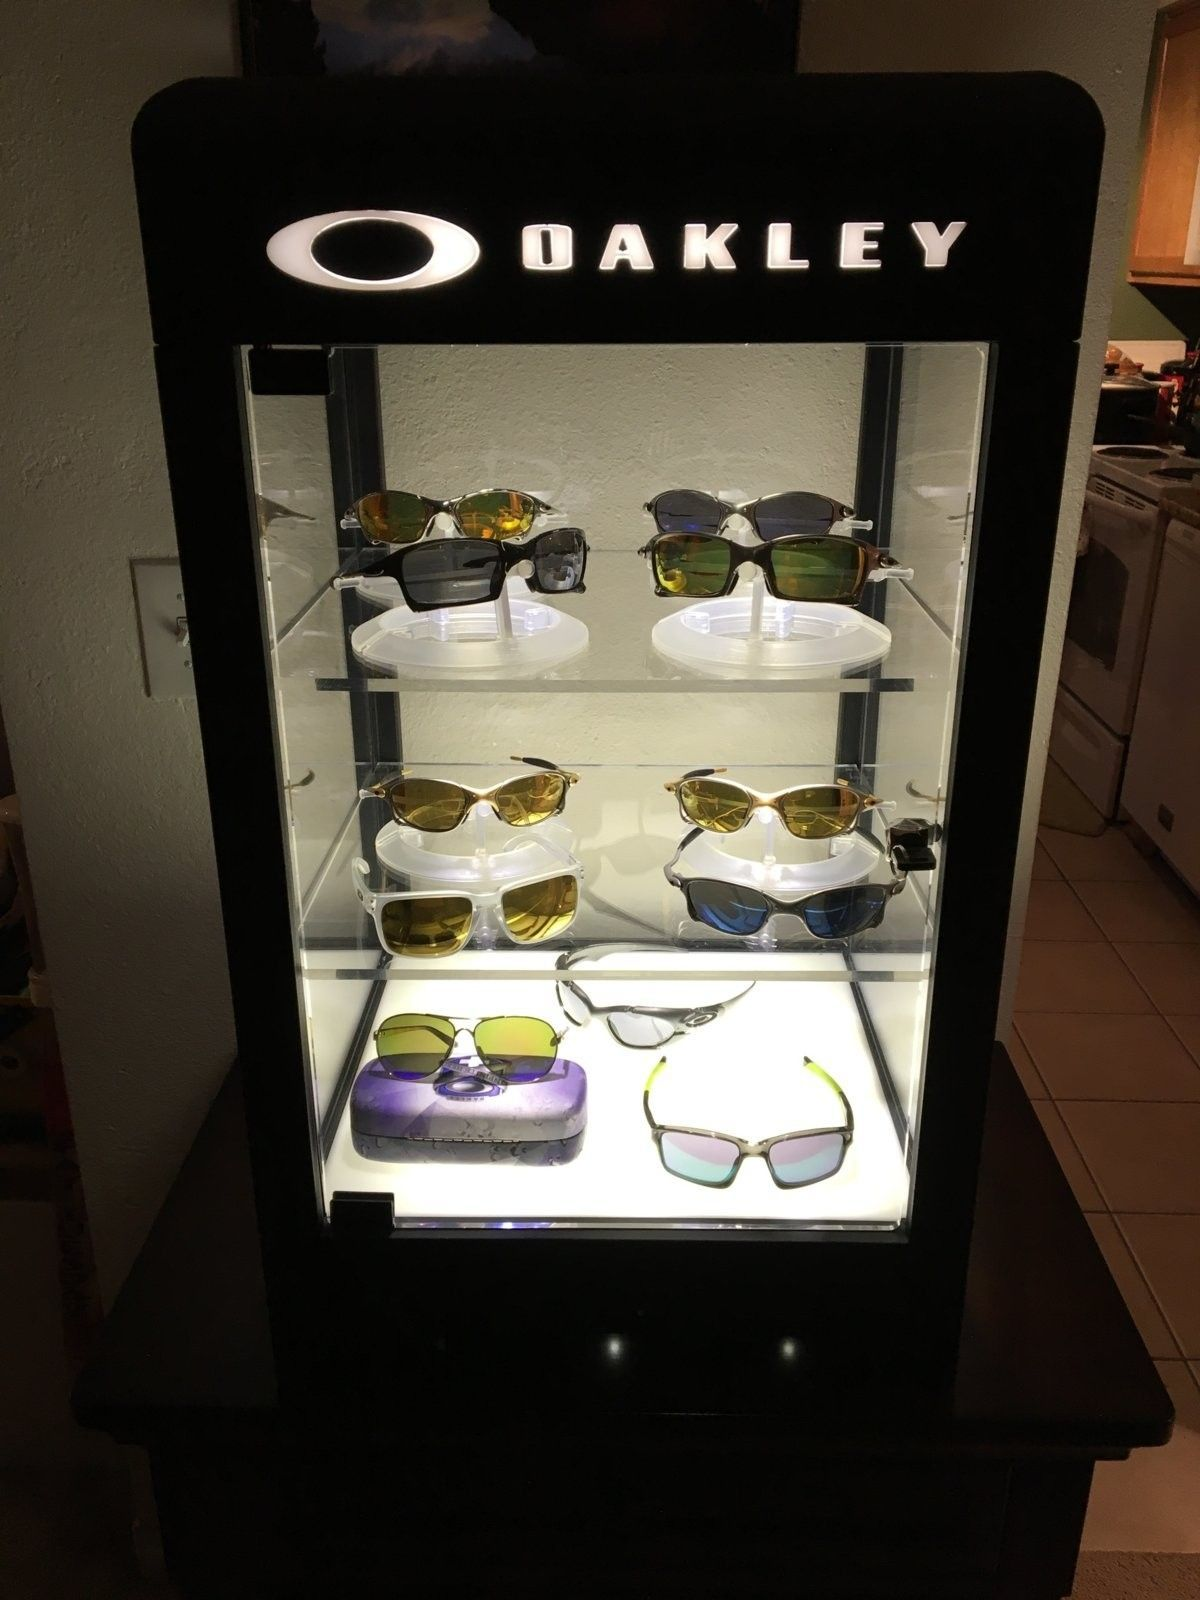 3.0 Oakley countertop display bulb question - image.jpeg